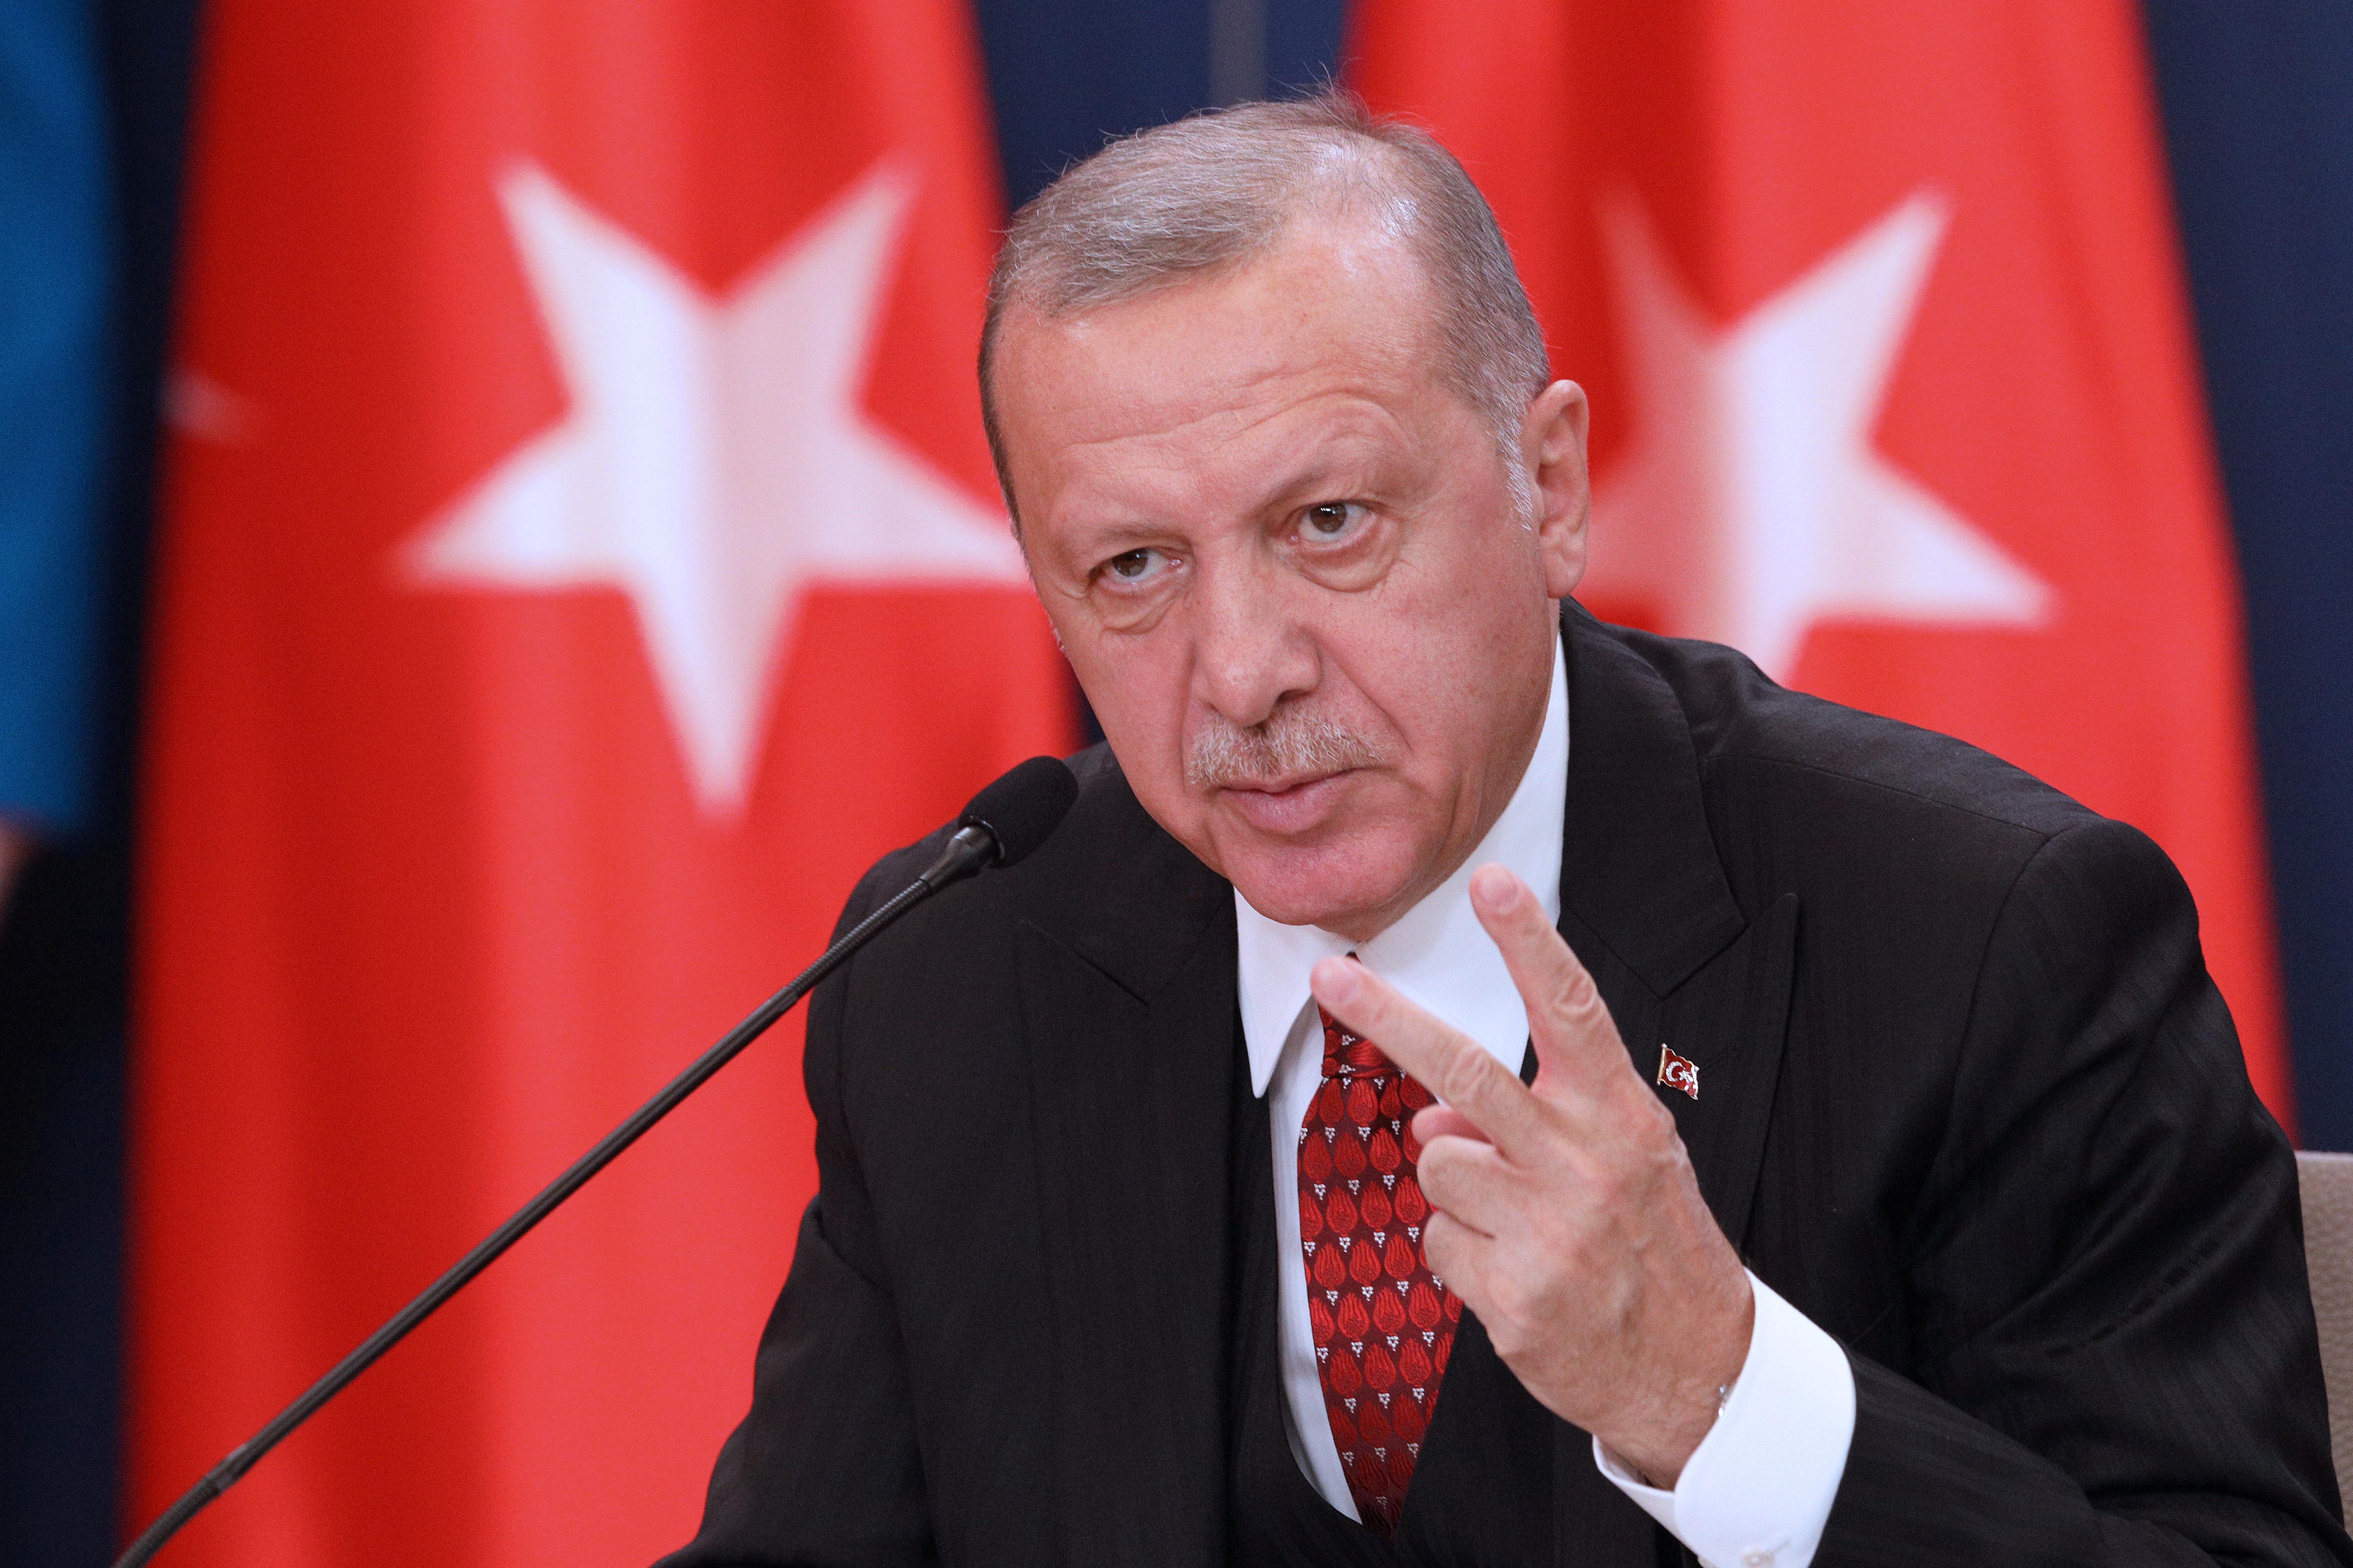 Turkey's Erdogan says alternatives to F-35 jets ready, receiving offers